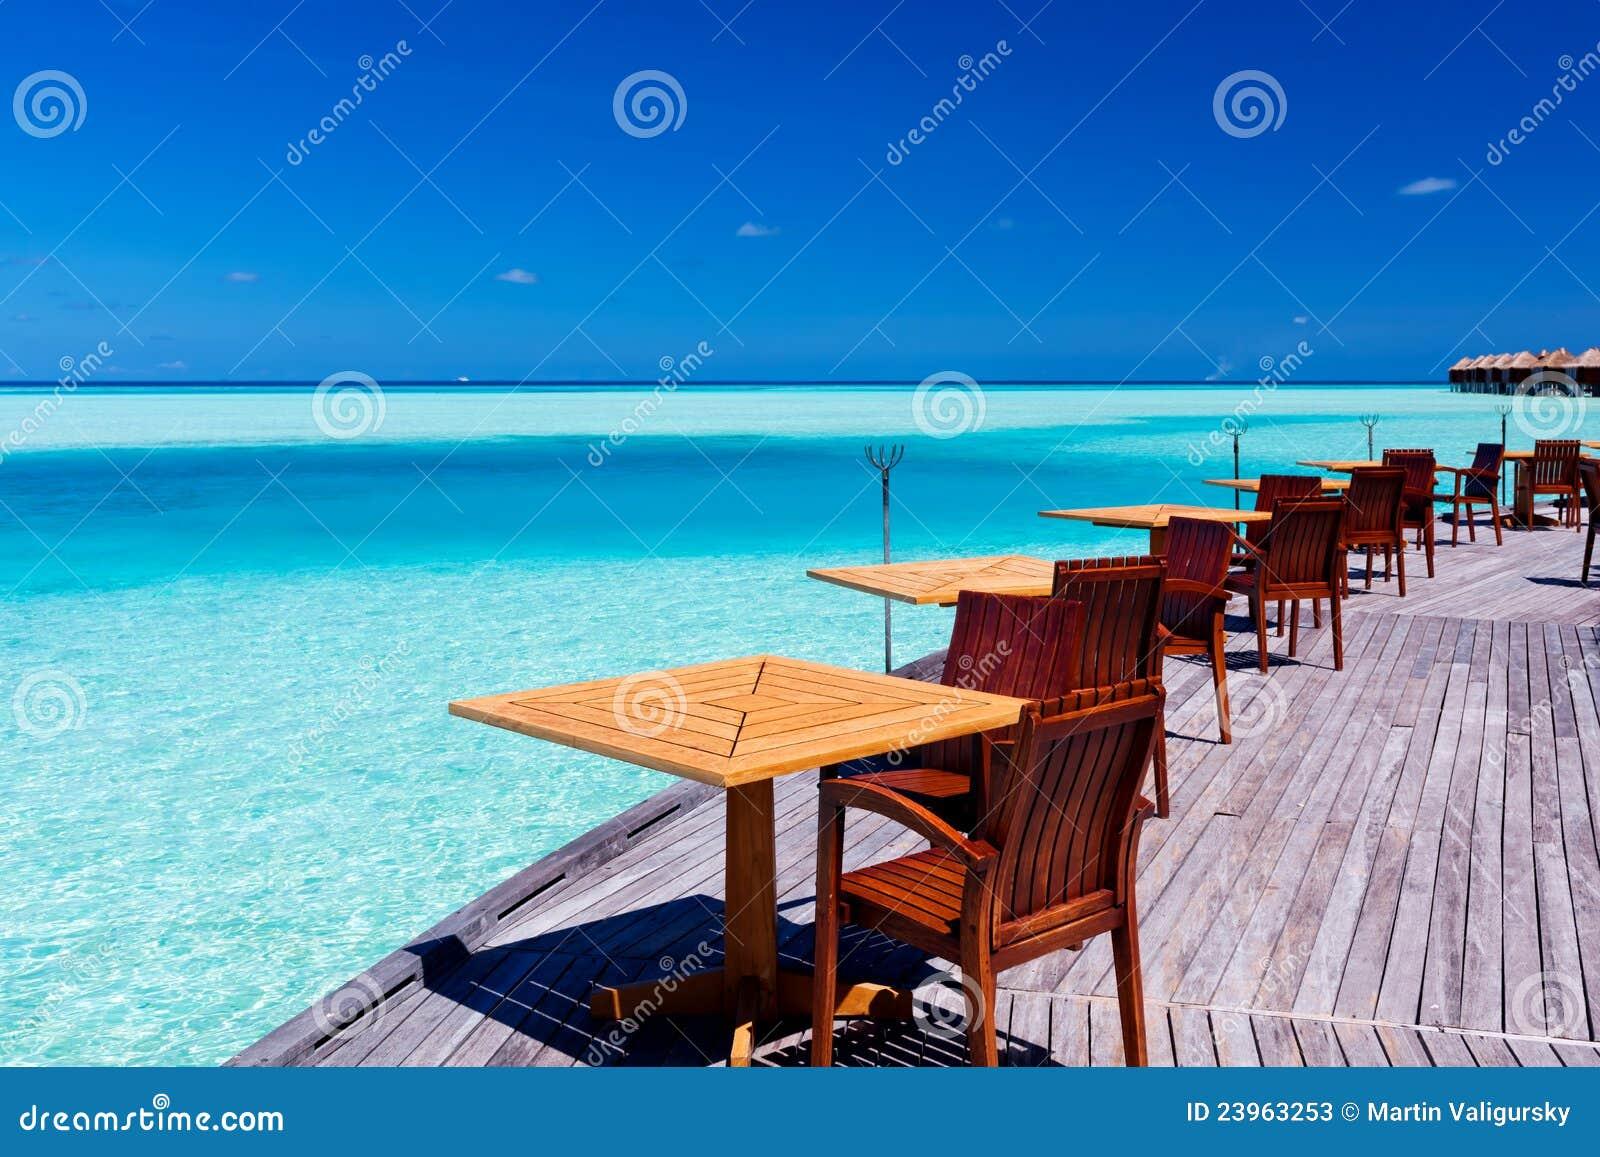 Top Tropical Beach Dining 1300 x 957 · 196 kB · jpeg